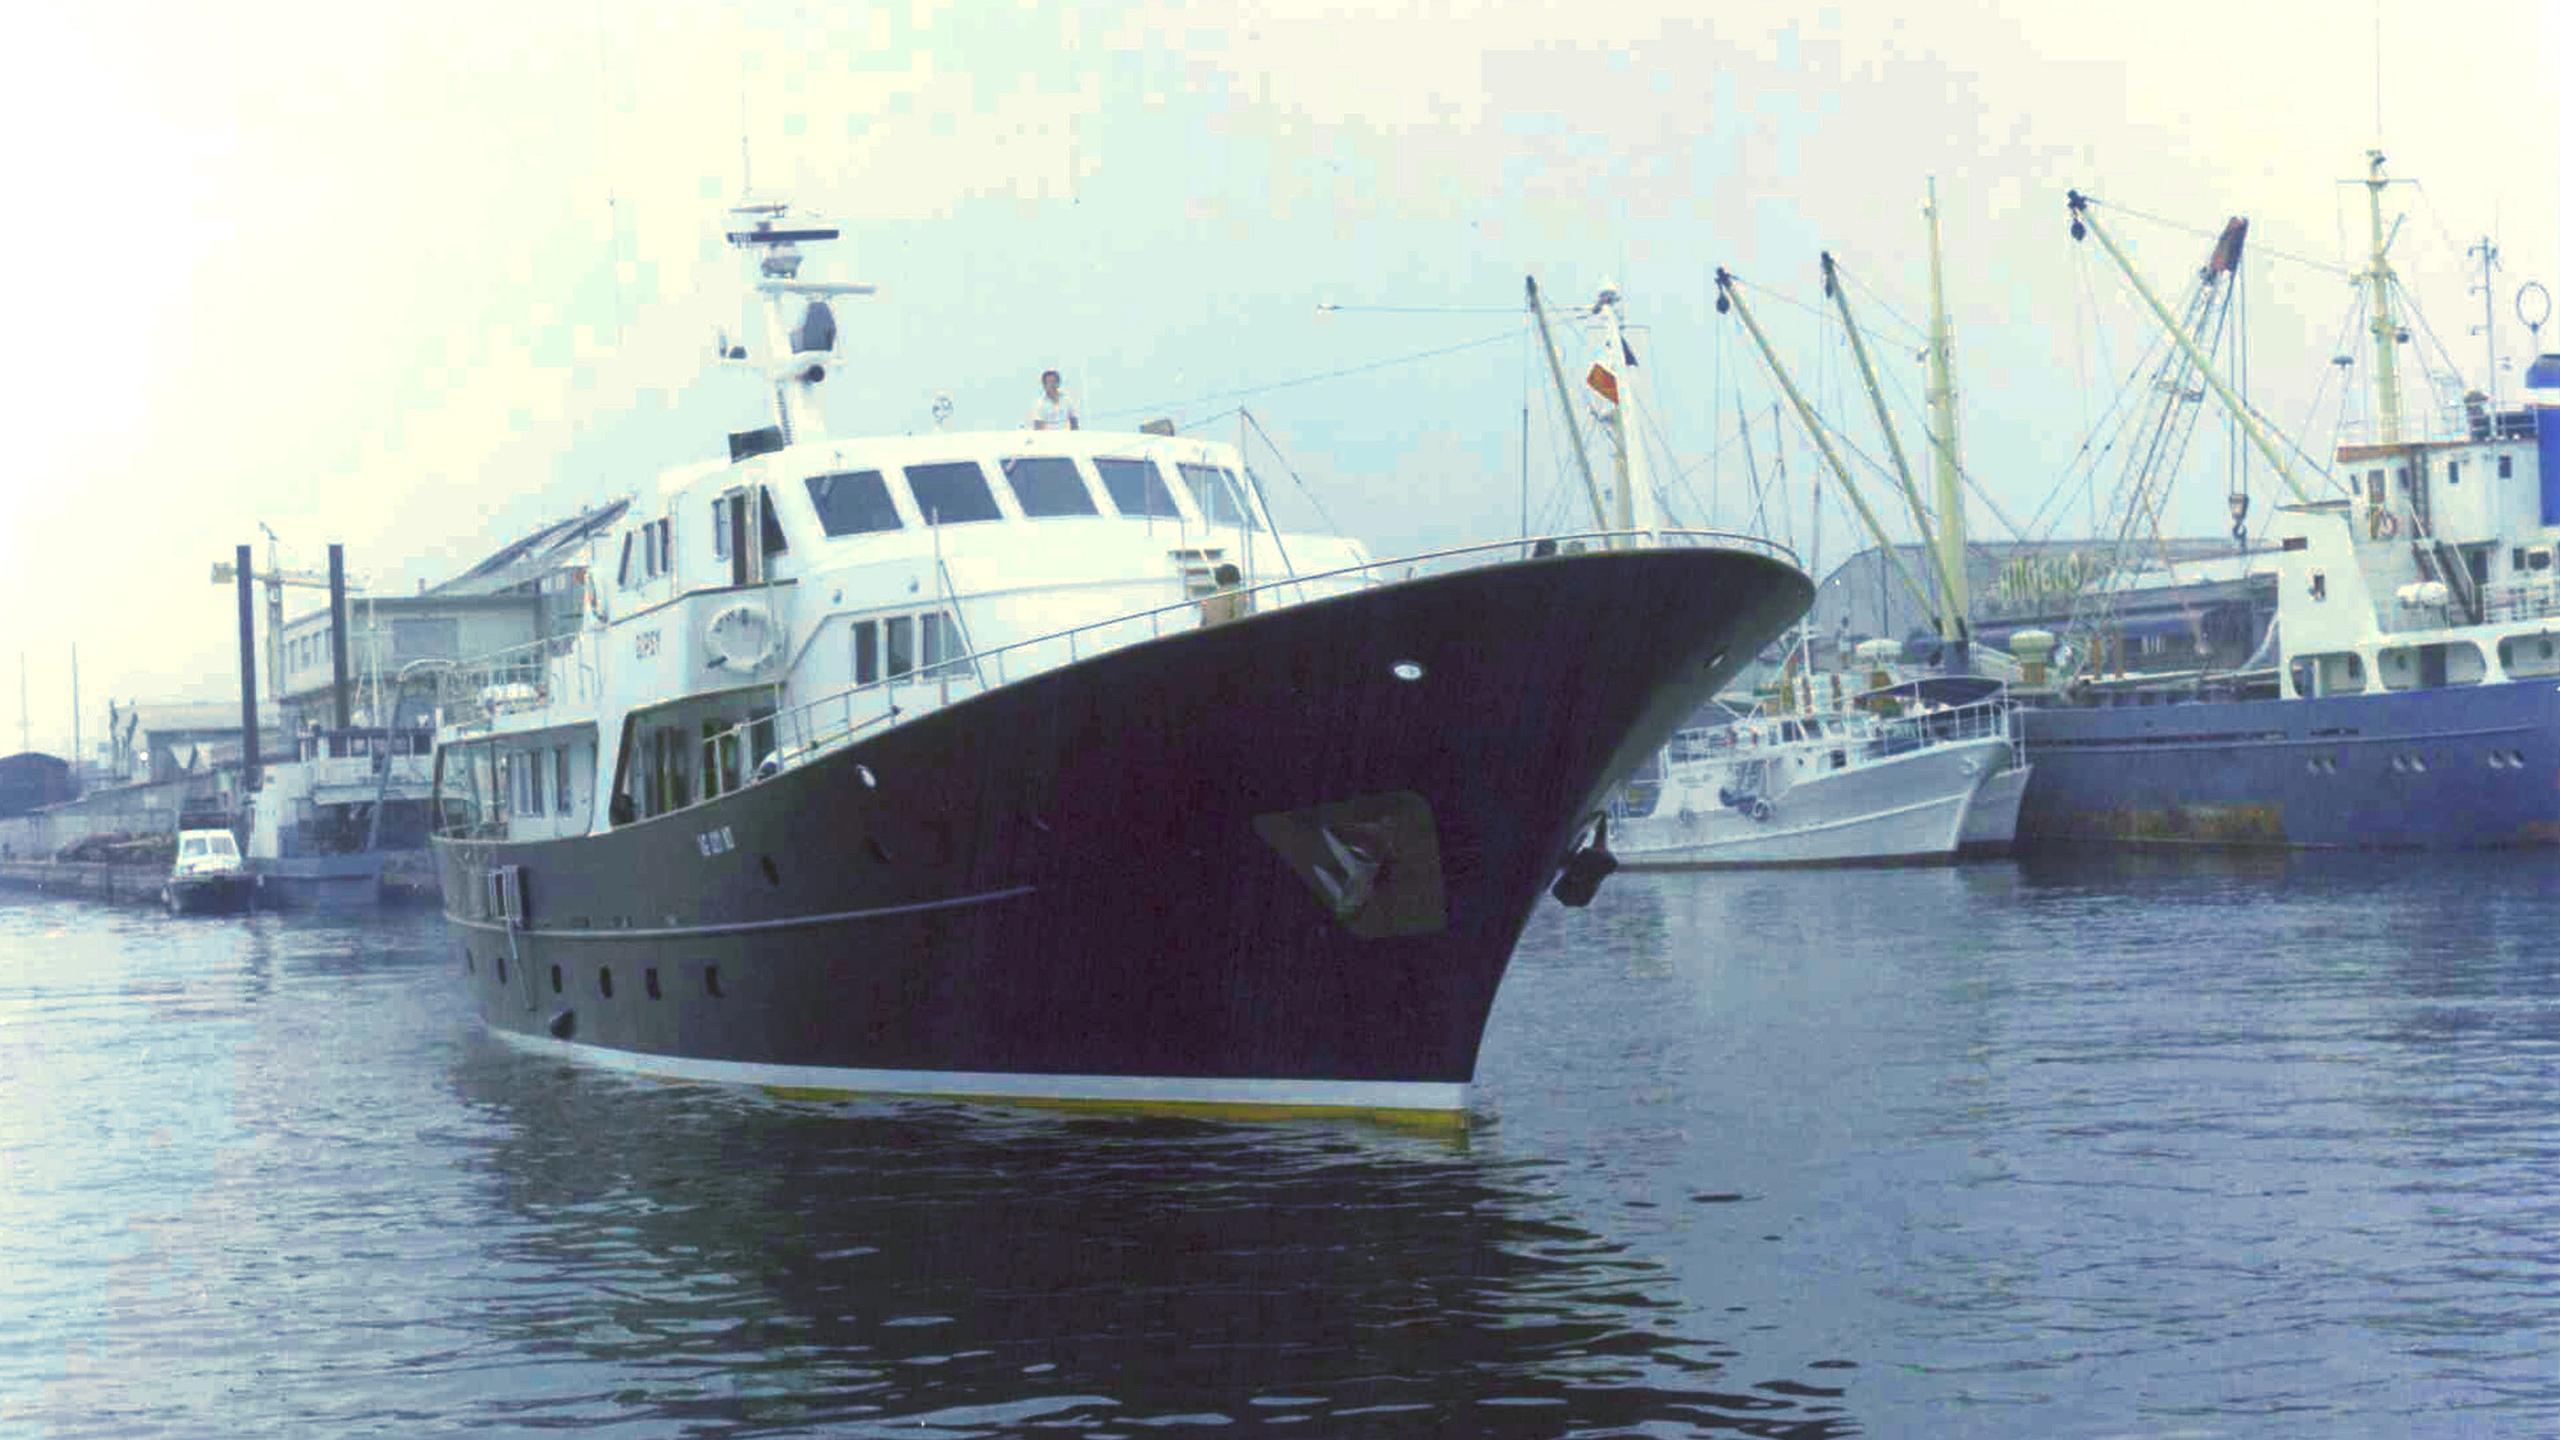 south-paw-c-motor-yacht-codecasa-1977-34m-half-bow